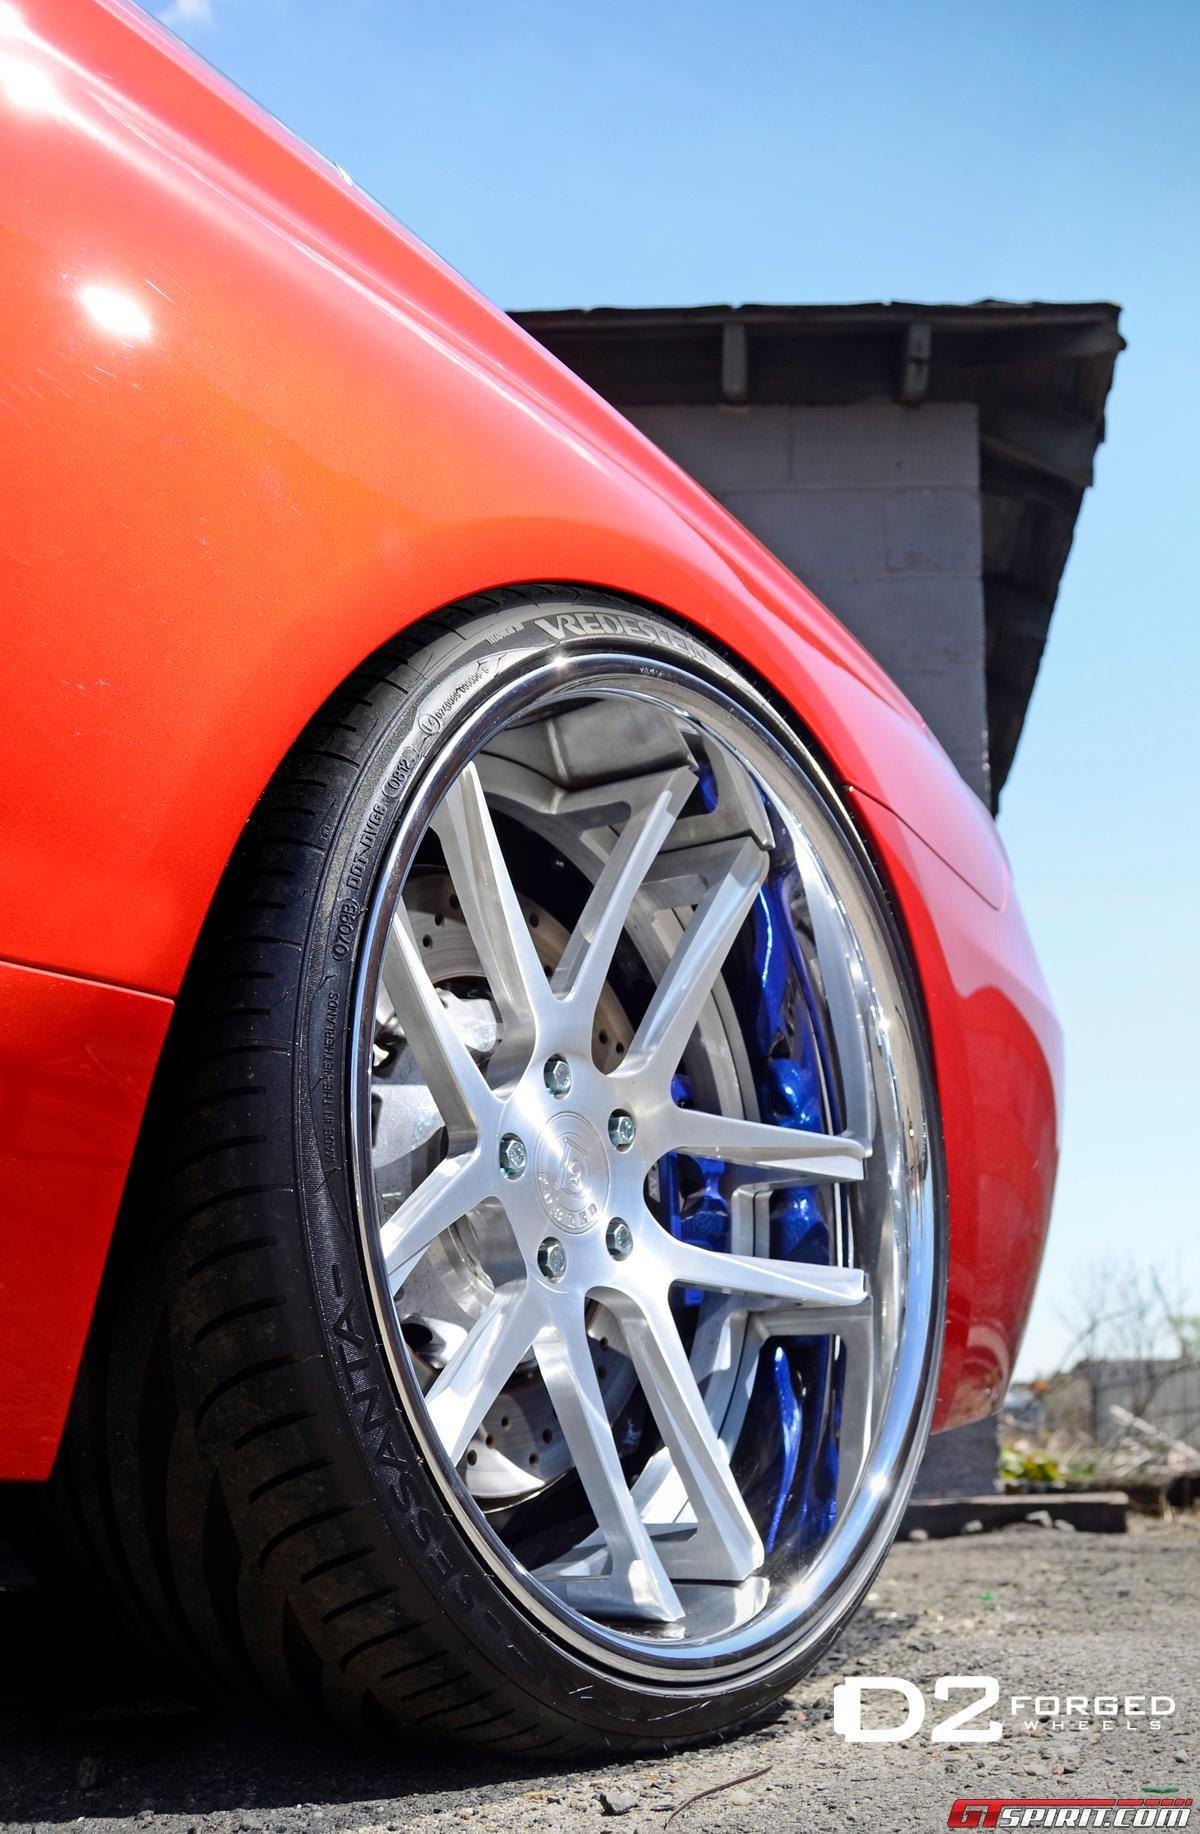 bmw-m-dforged-vs-wheels-Hd-Bmw-M-Coupe-Bmw-M-Coupe-Wallp-wallpaper-wp3603603